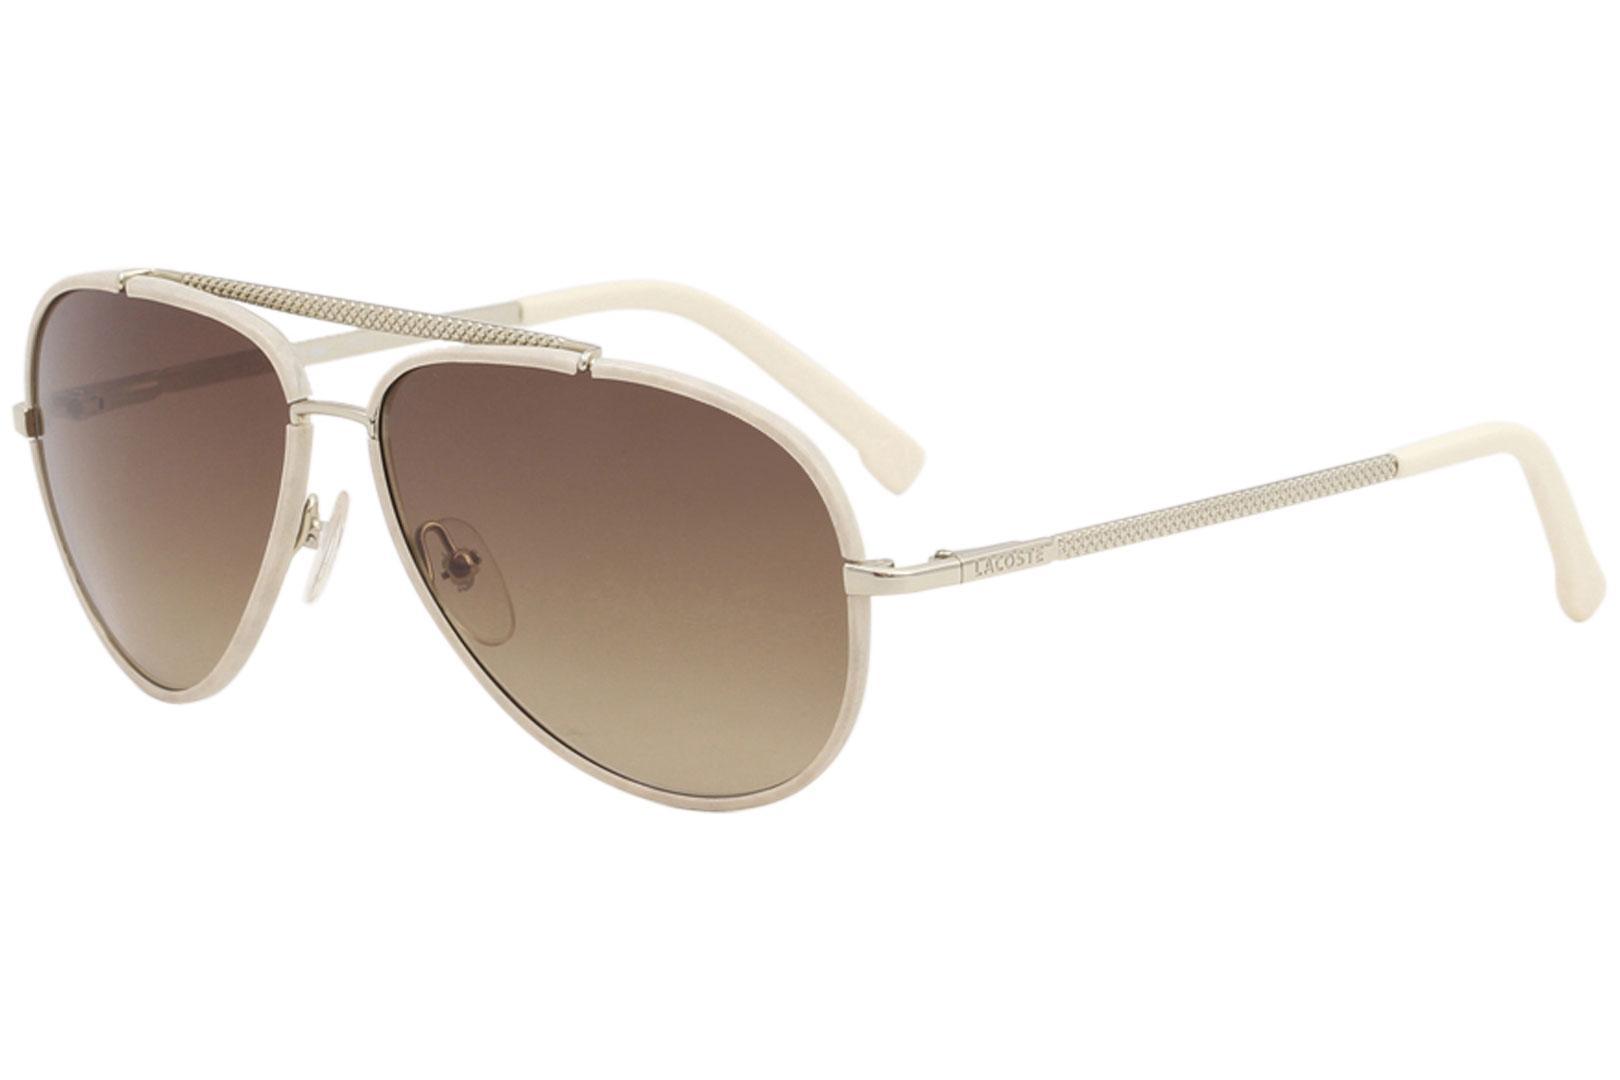 e22ac2ad2d Lacoste Women s L152S L 152 S Fashion Pilot Sunglasses